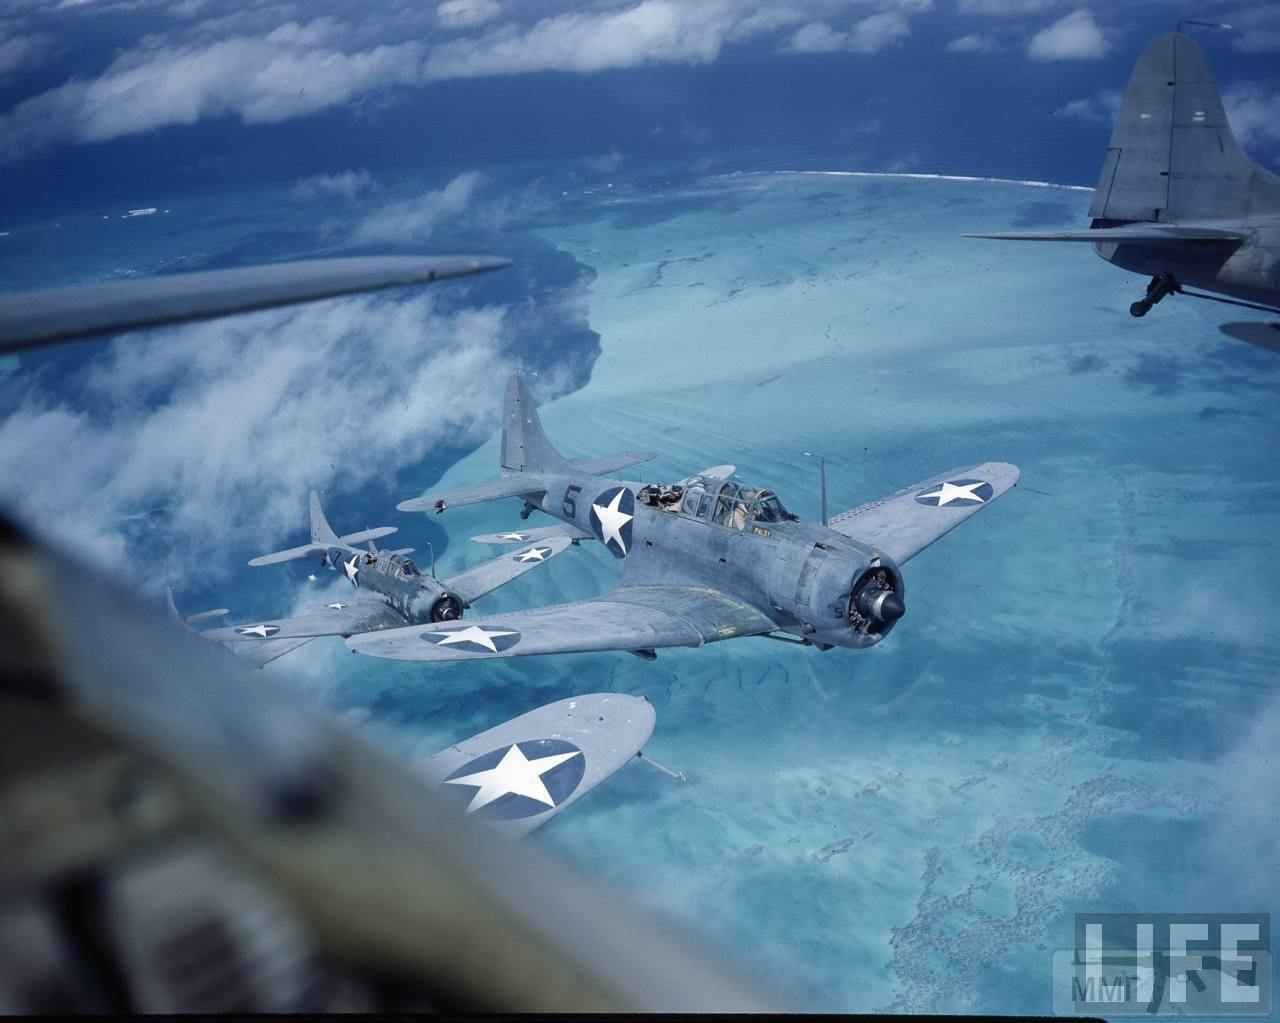 104365 - Война на Тихом океане в цвете